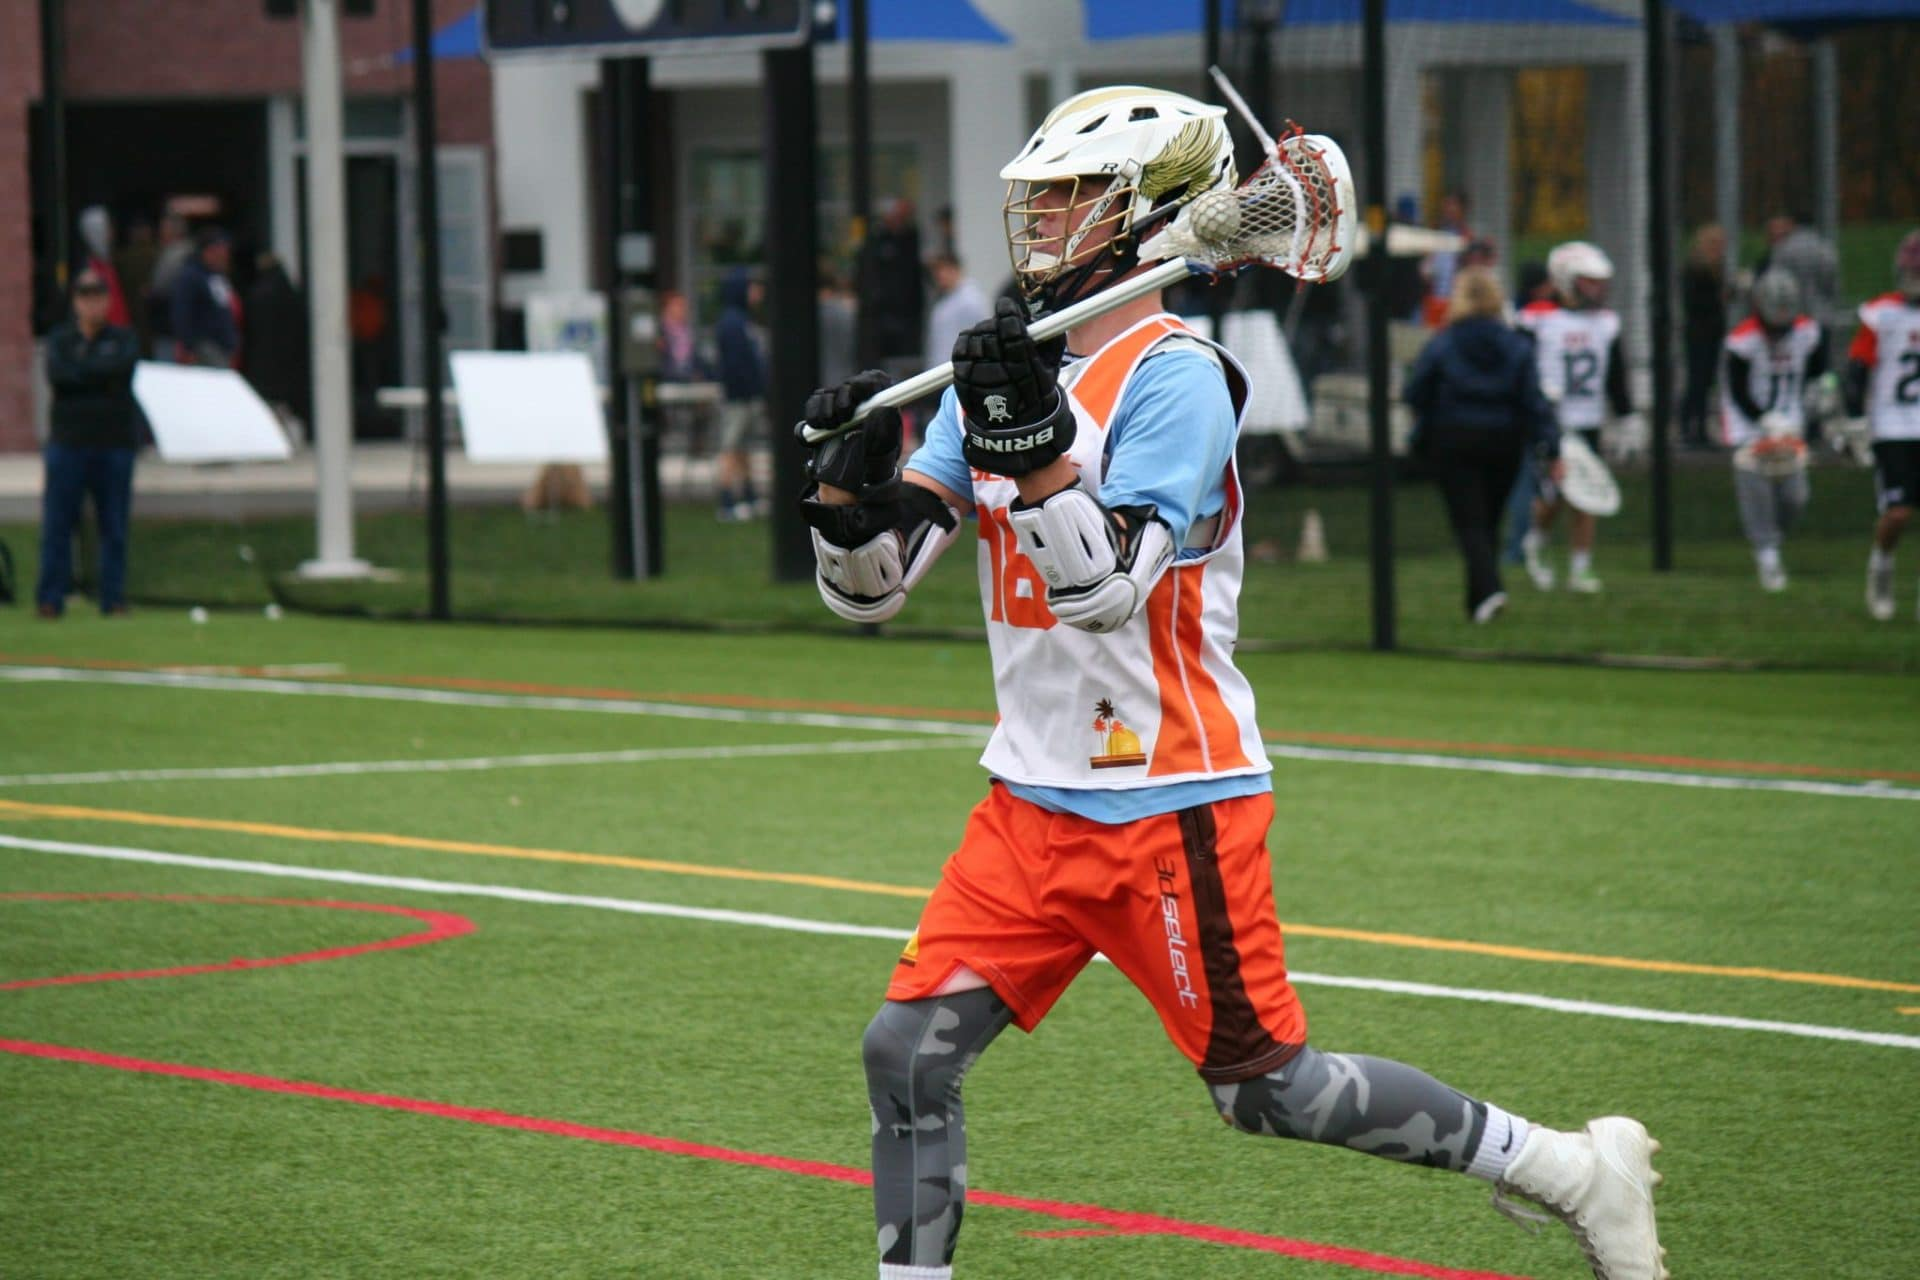 Del Norte sophomore Luke Welch commited to Marquette Men's Lacrosse